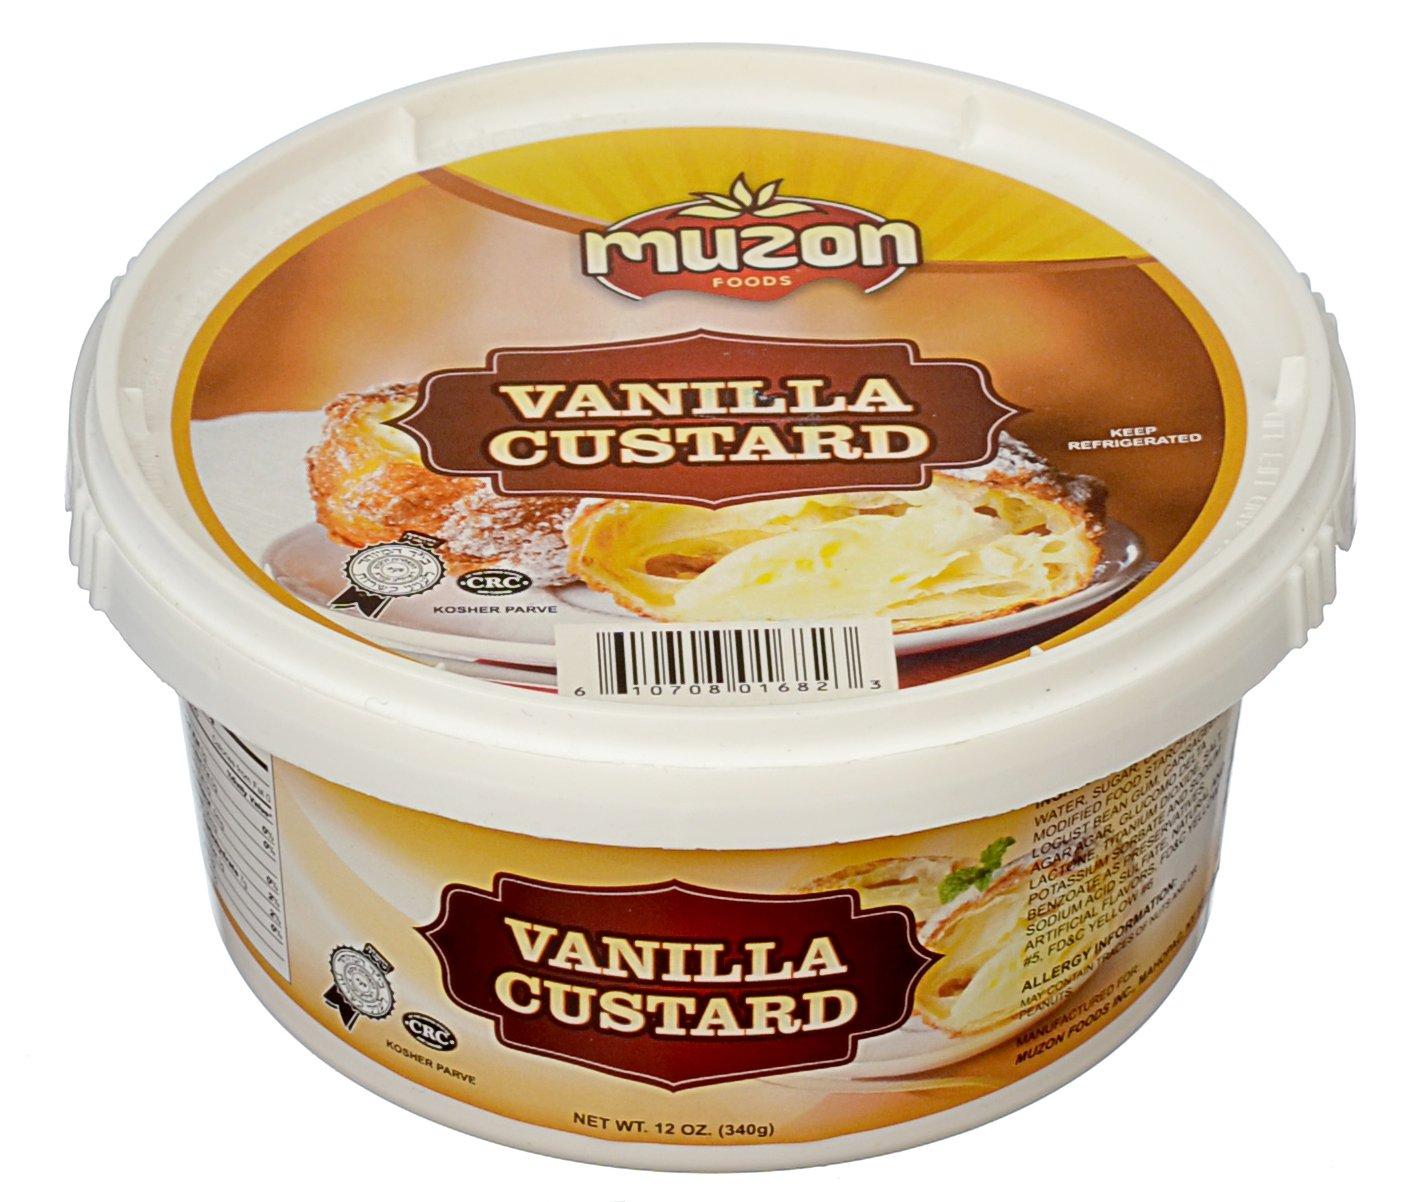 Muzon Chanukah Bavarian Cream Filling, Vanilla Custard Cream, Professional Bavarian Cream Pastry, Dessert, and Cupcake Filling, Cream filled donuts, krispy kreme doughnuts